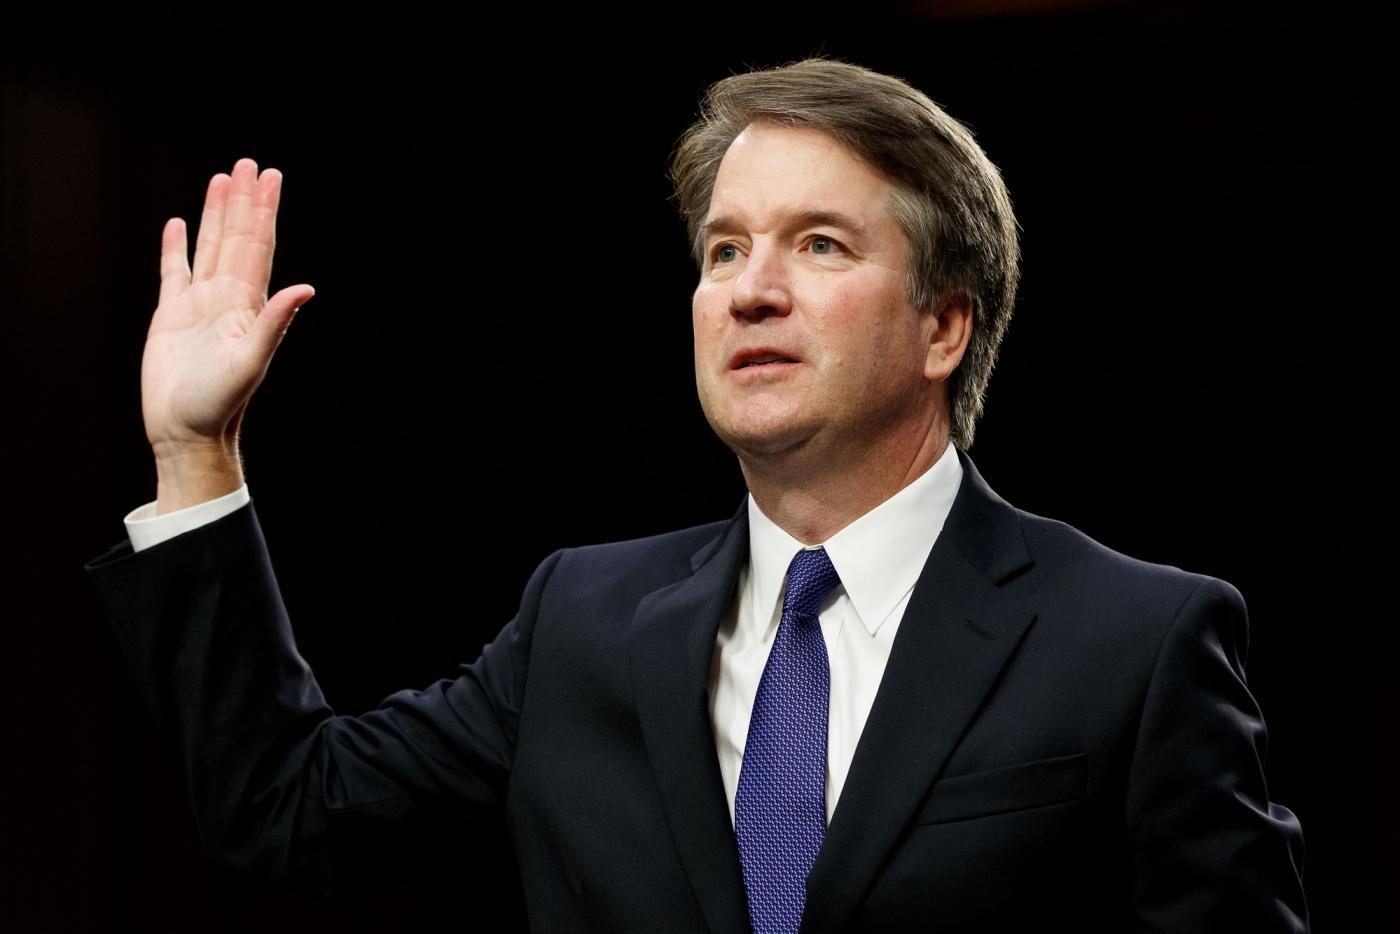 Kavanaugh argues he's an 'independent, impartial judge ...  Impartial Judge